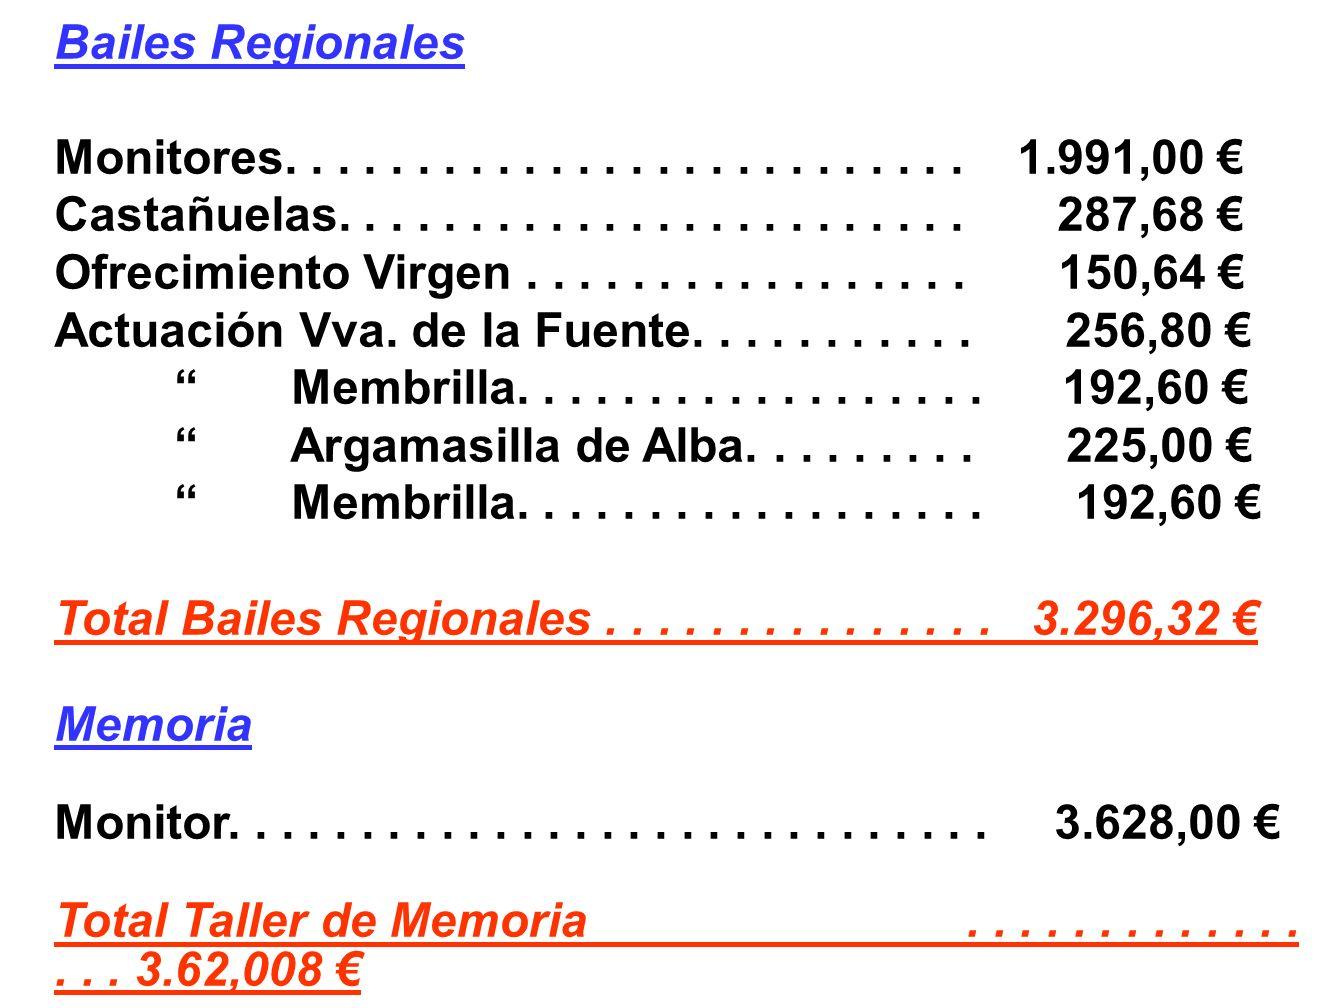 Bailes Regionales Monitores. . . . . . . . . . . . . . . . . . . . . . . . . . 1.991,00 €